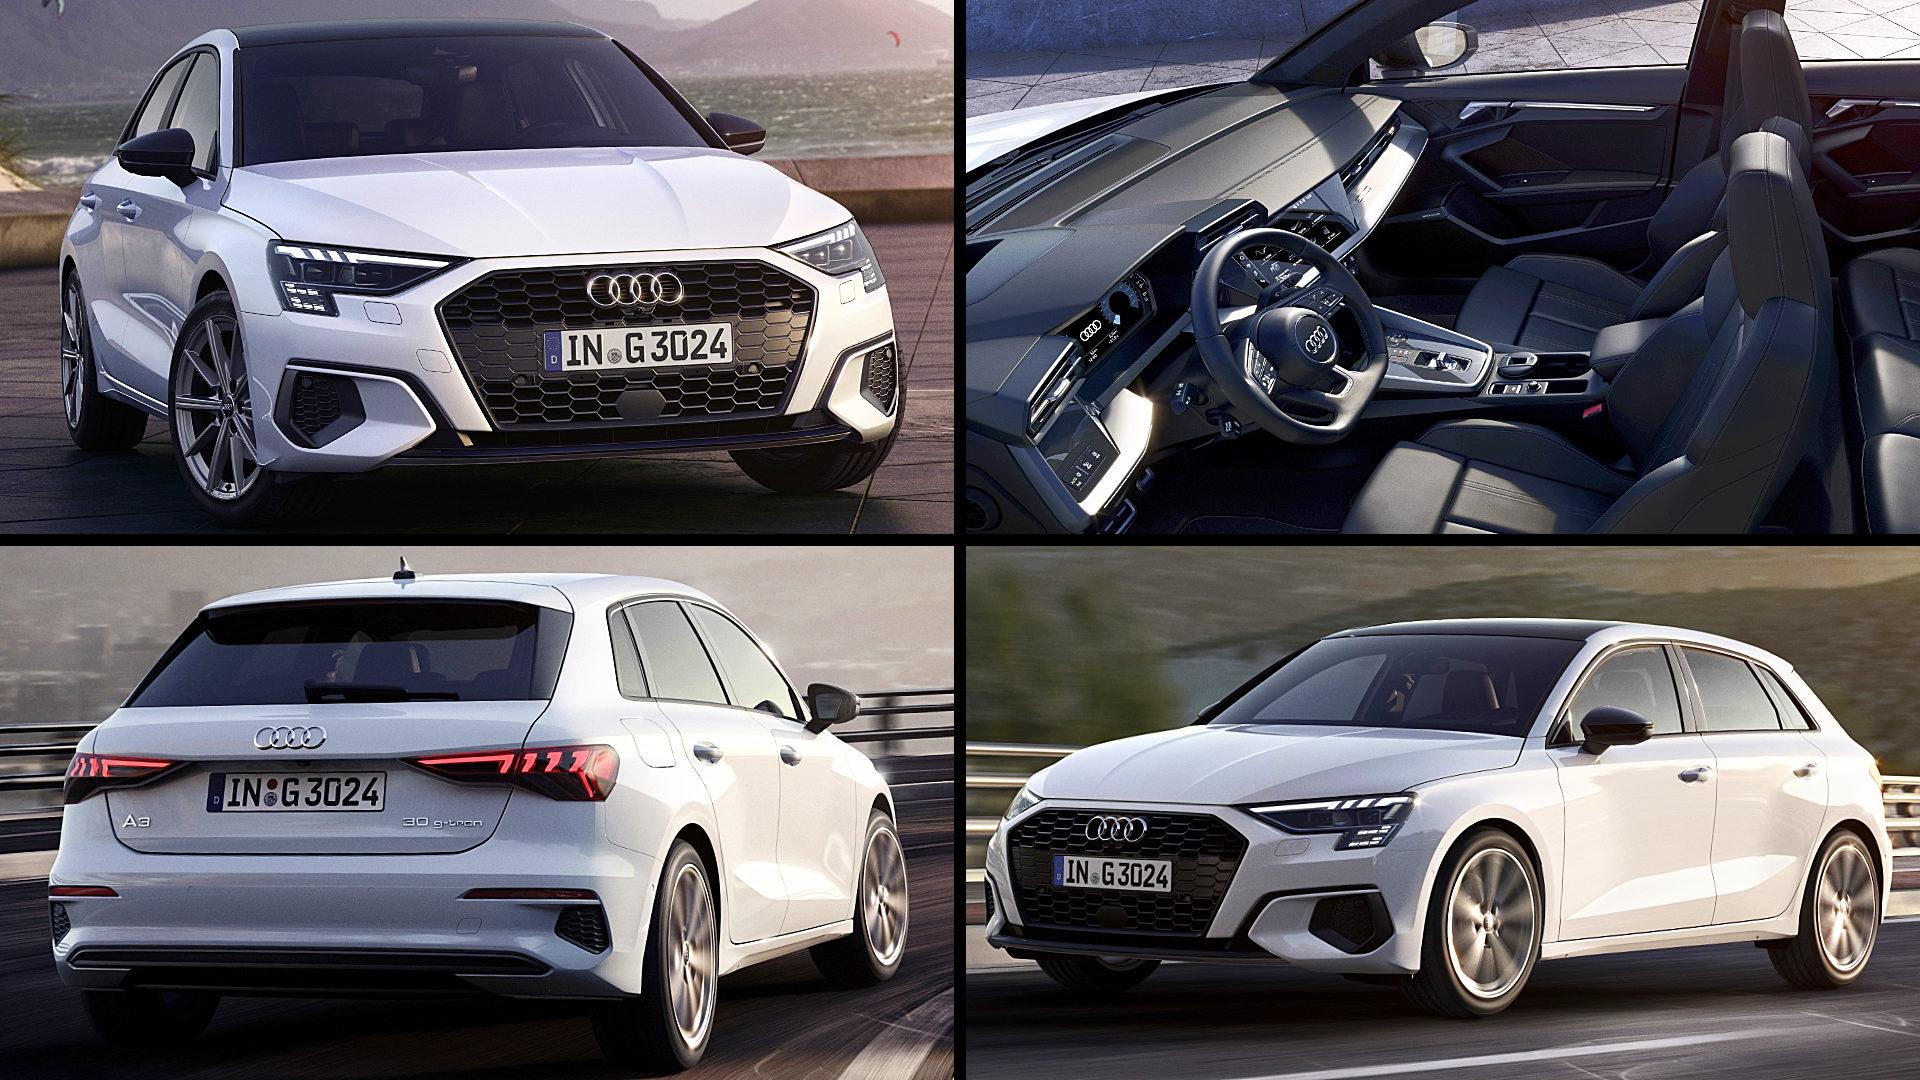 Audi Hatchback A3 White 2021